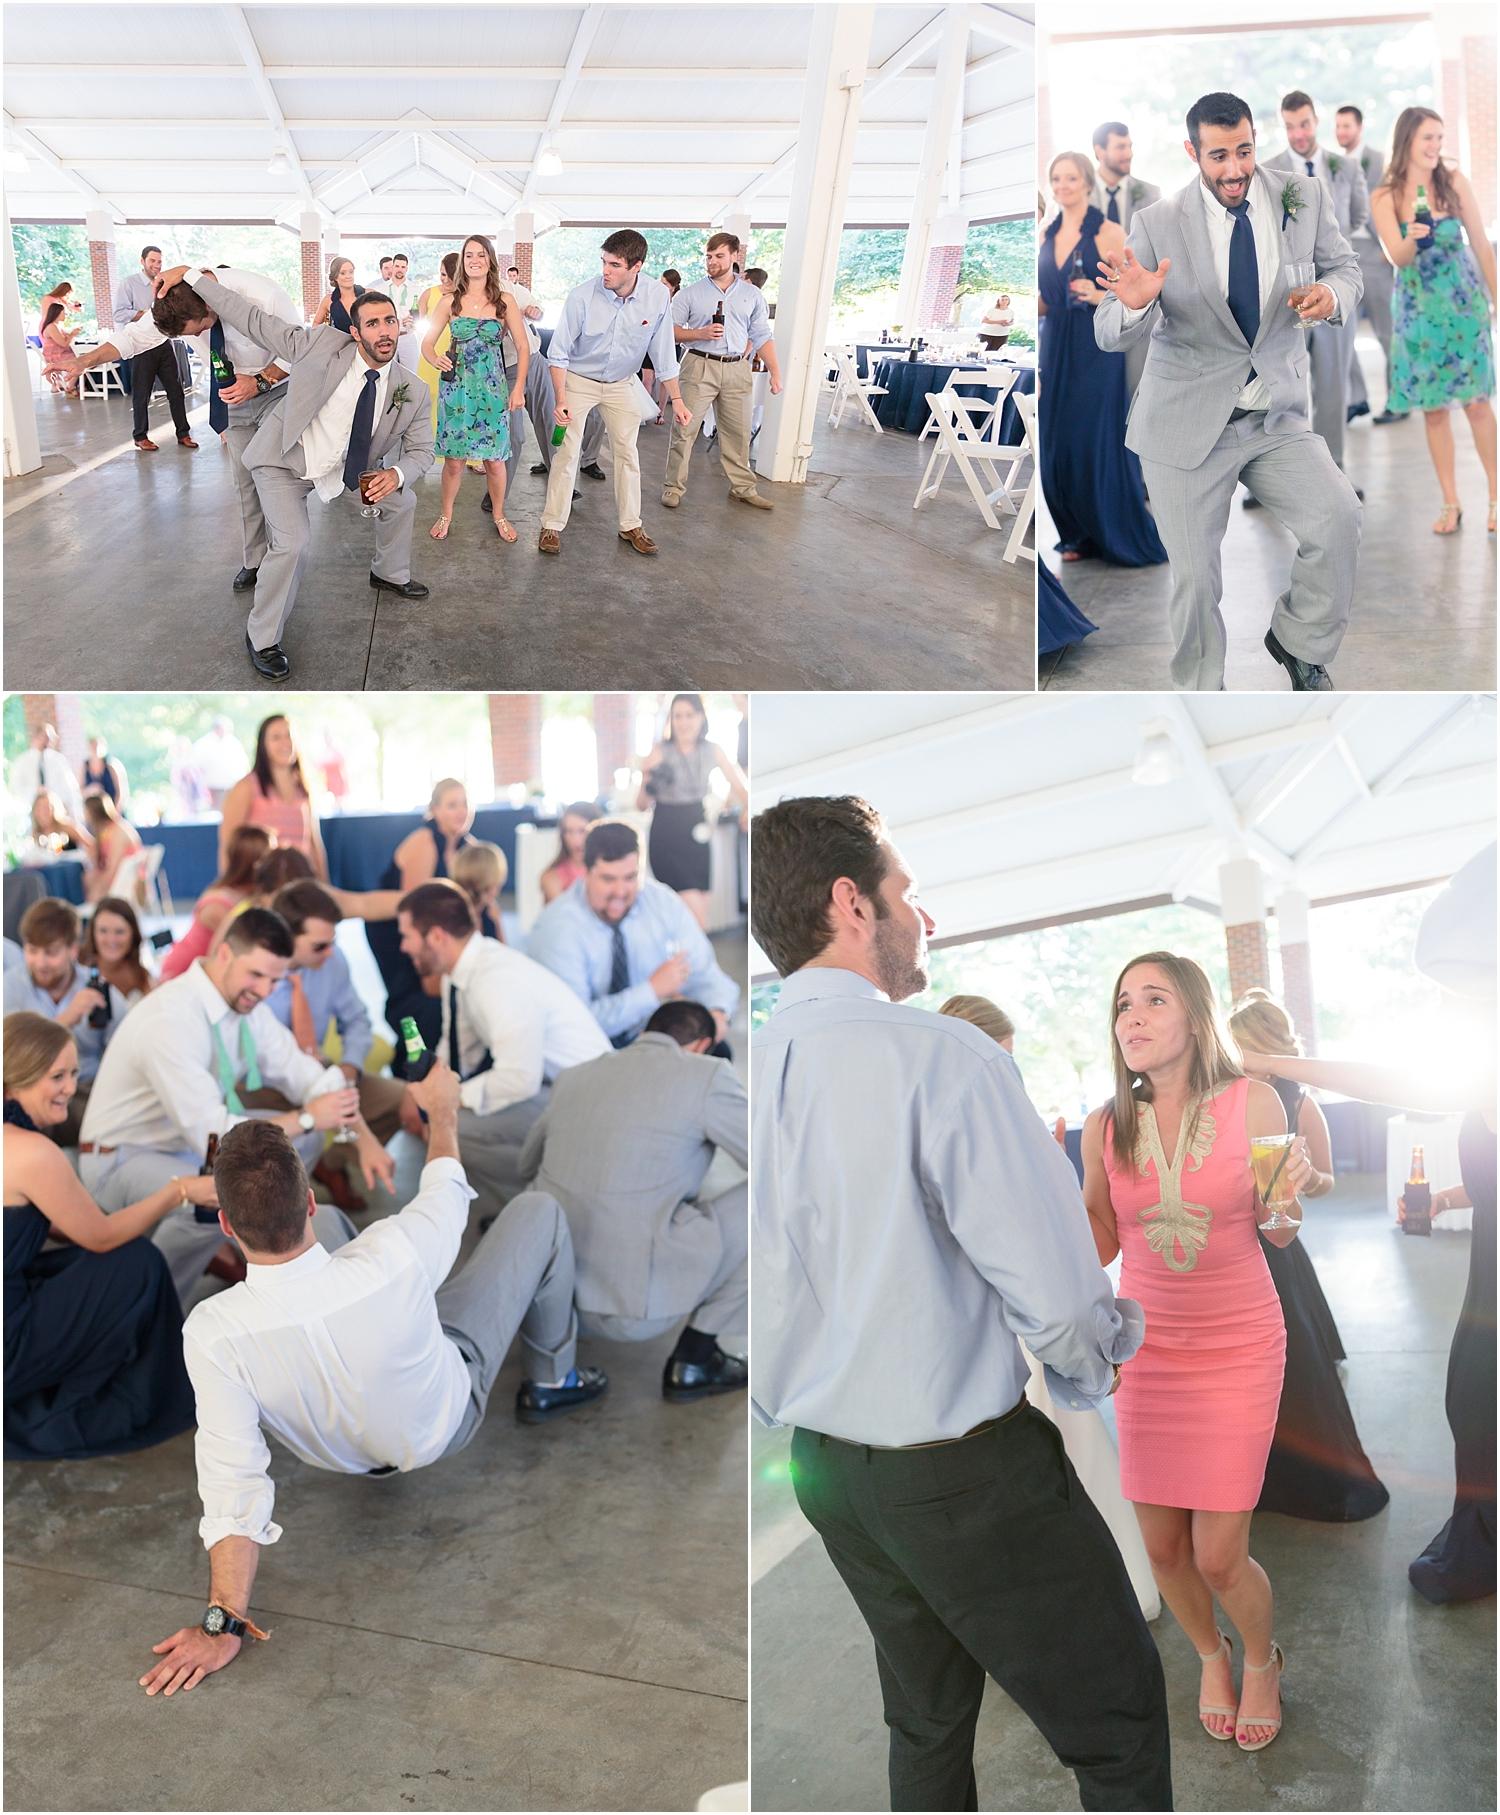 To Color,clemson golf course,clemson summer wedding,clemson tiger wedding,clemson tigers,clemson wedding,madren center,reception,